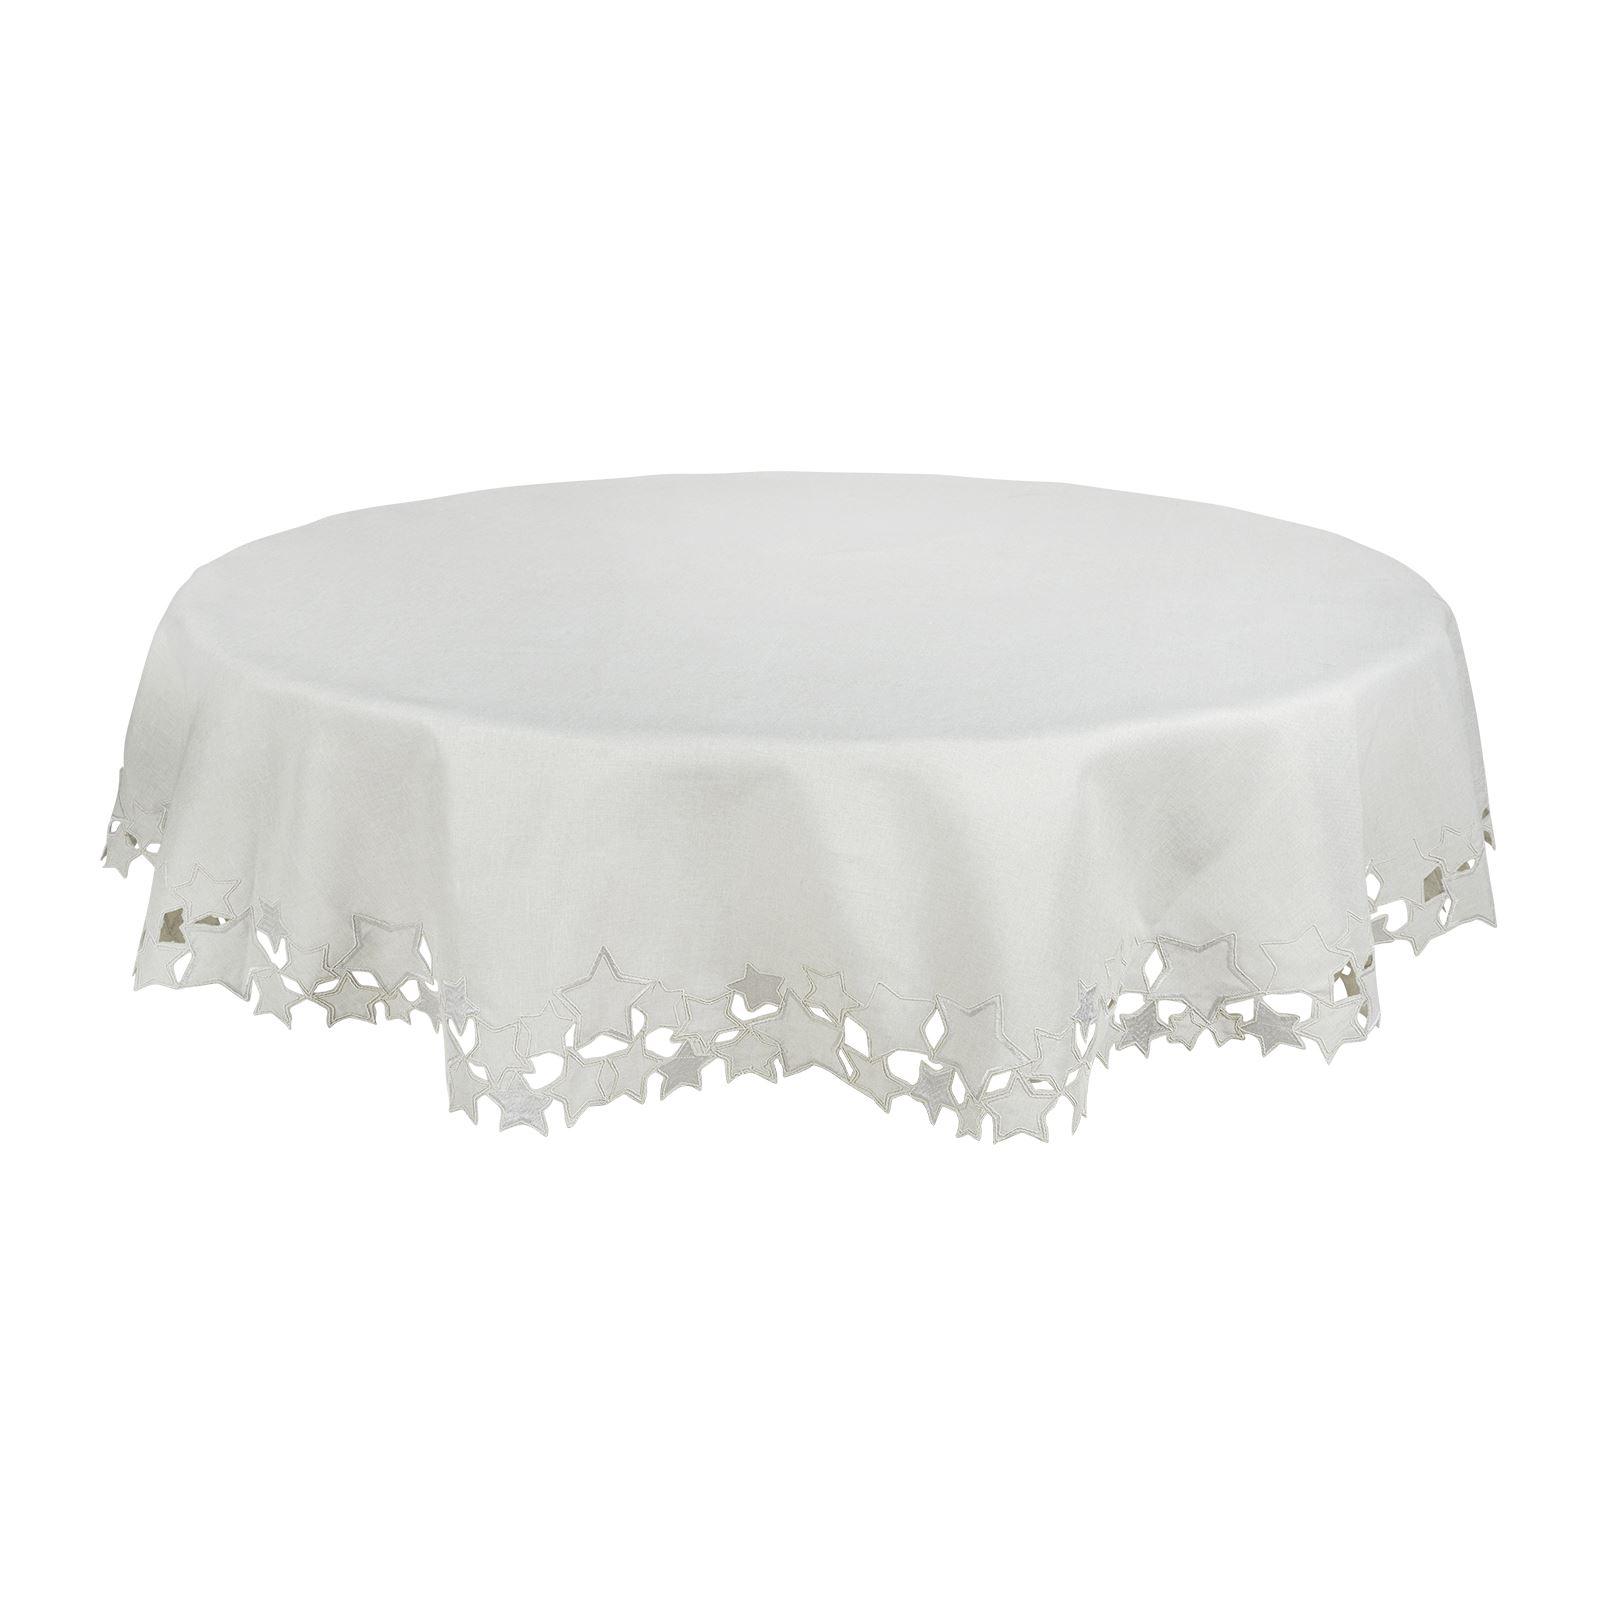 Christmas-Tablecloth-Festive-Pattern-Rectangle-Round-Fabric-Xmas-Room-Decoration Indexbild 137